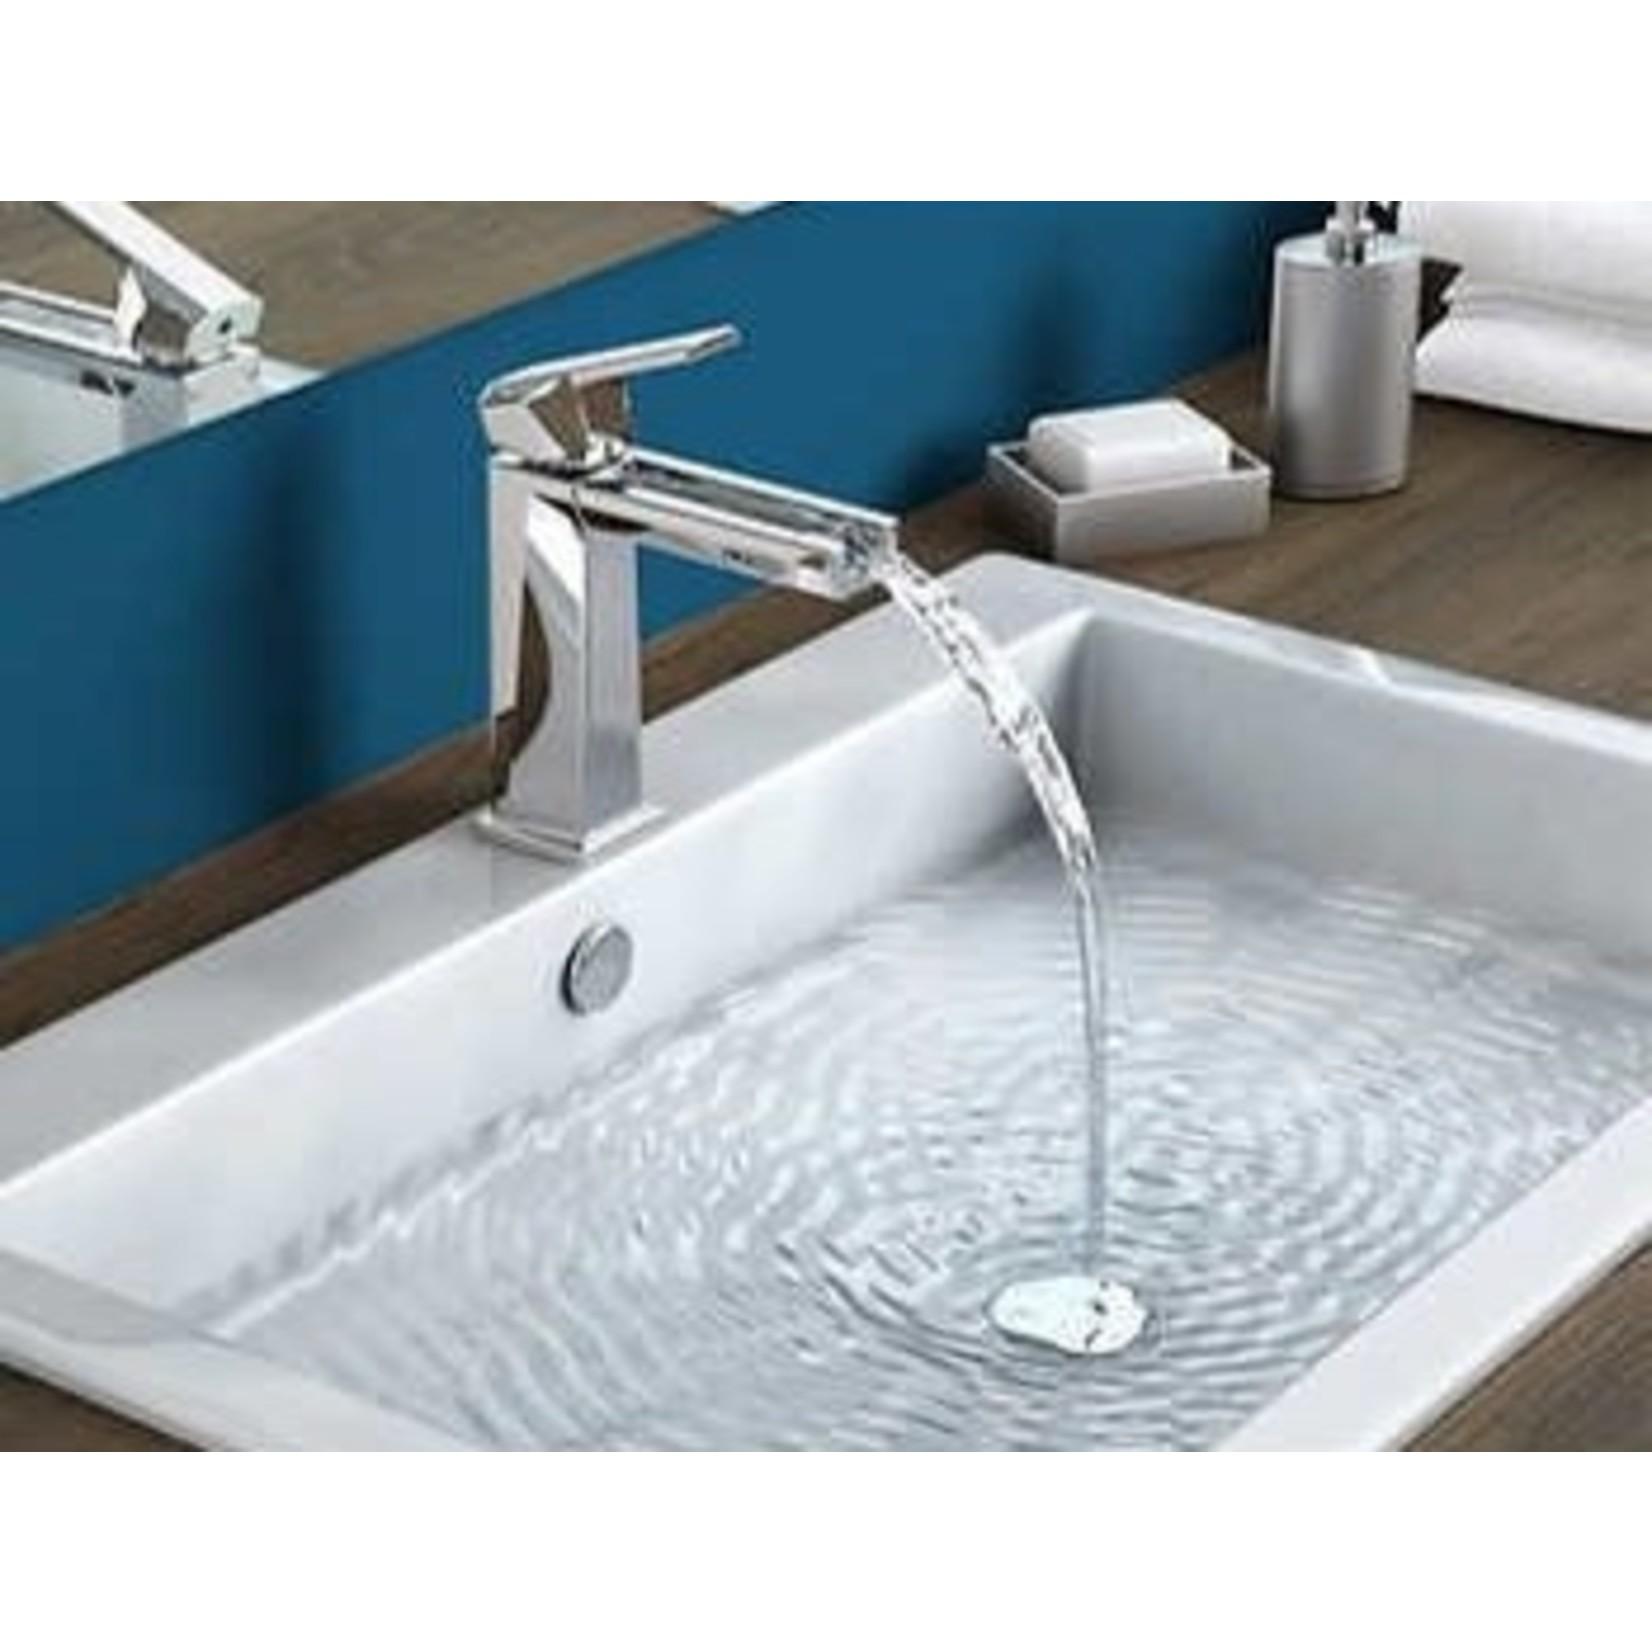 Mono tap Artika Aquaflow chrome + pop-up included